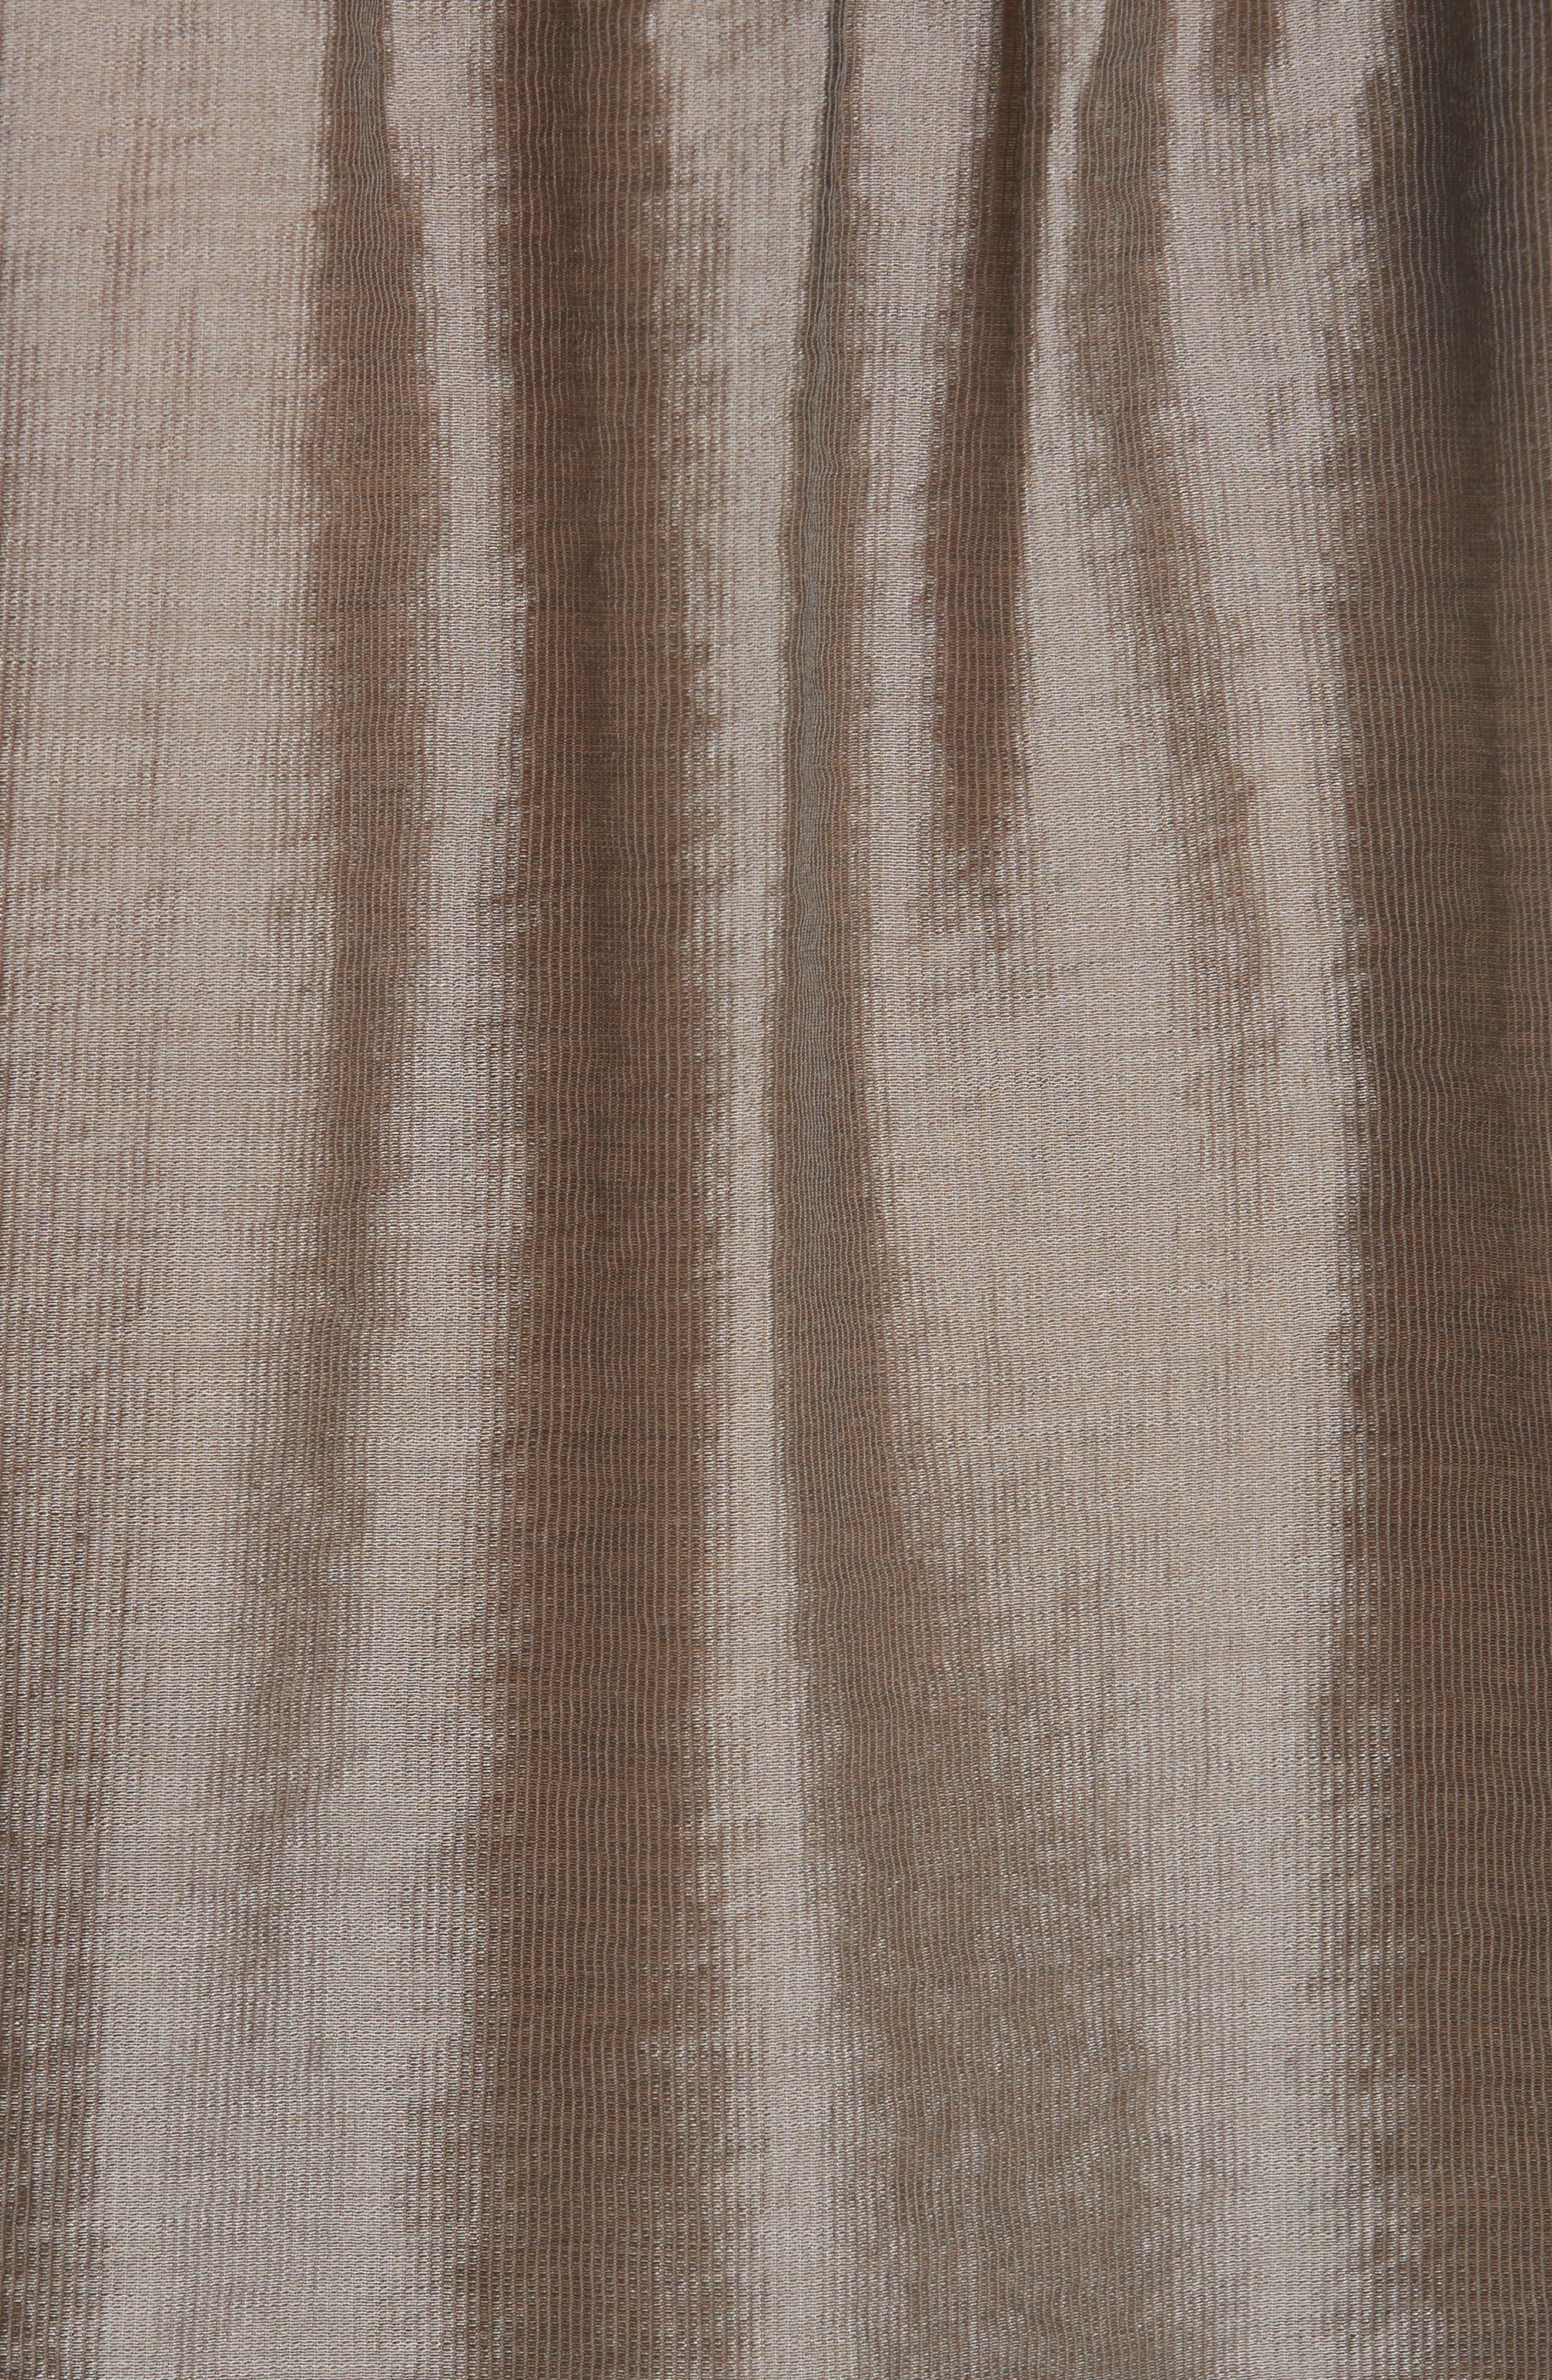 Lidelle Tie Front Tunic Top,                             Alternate thumbnail 5, color,                             Moss